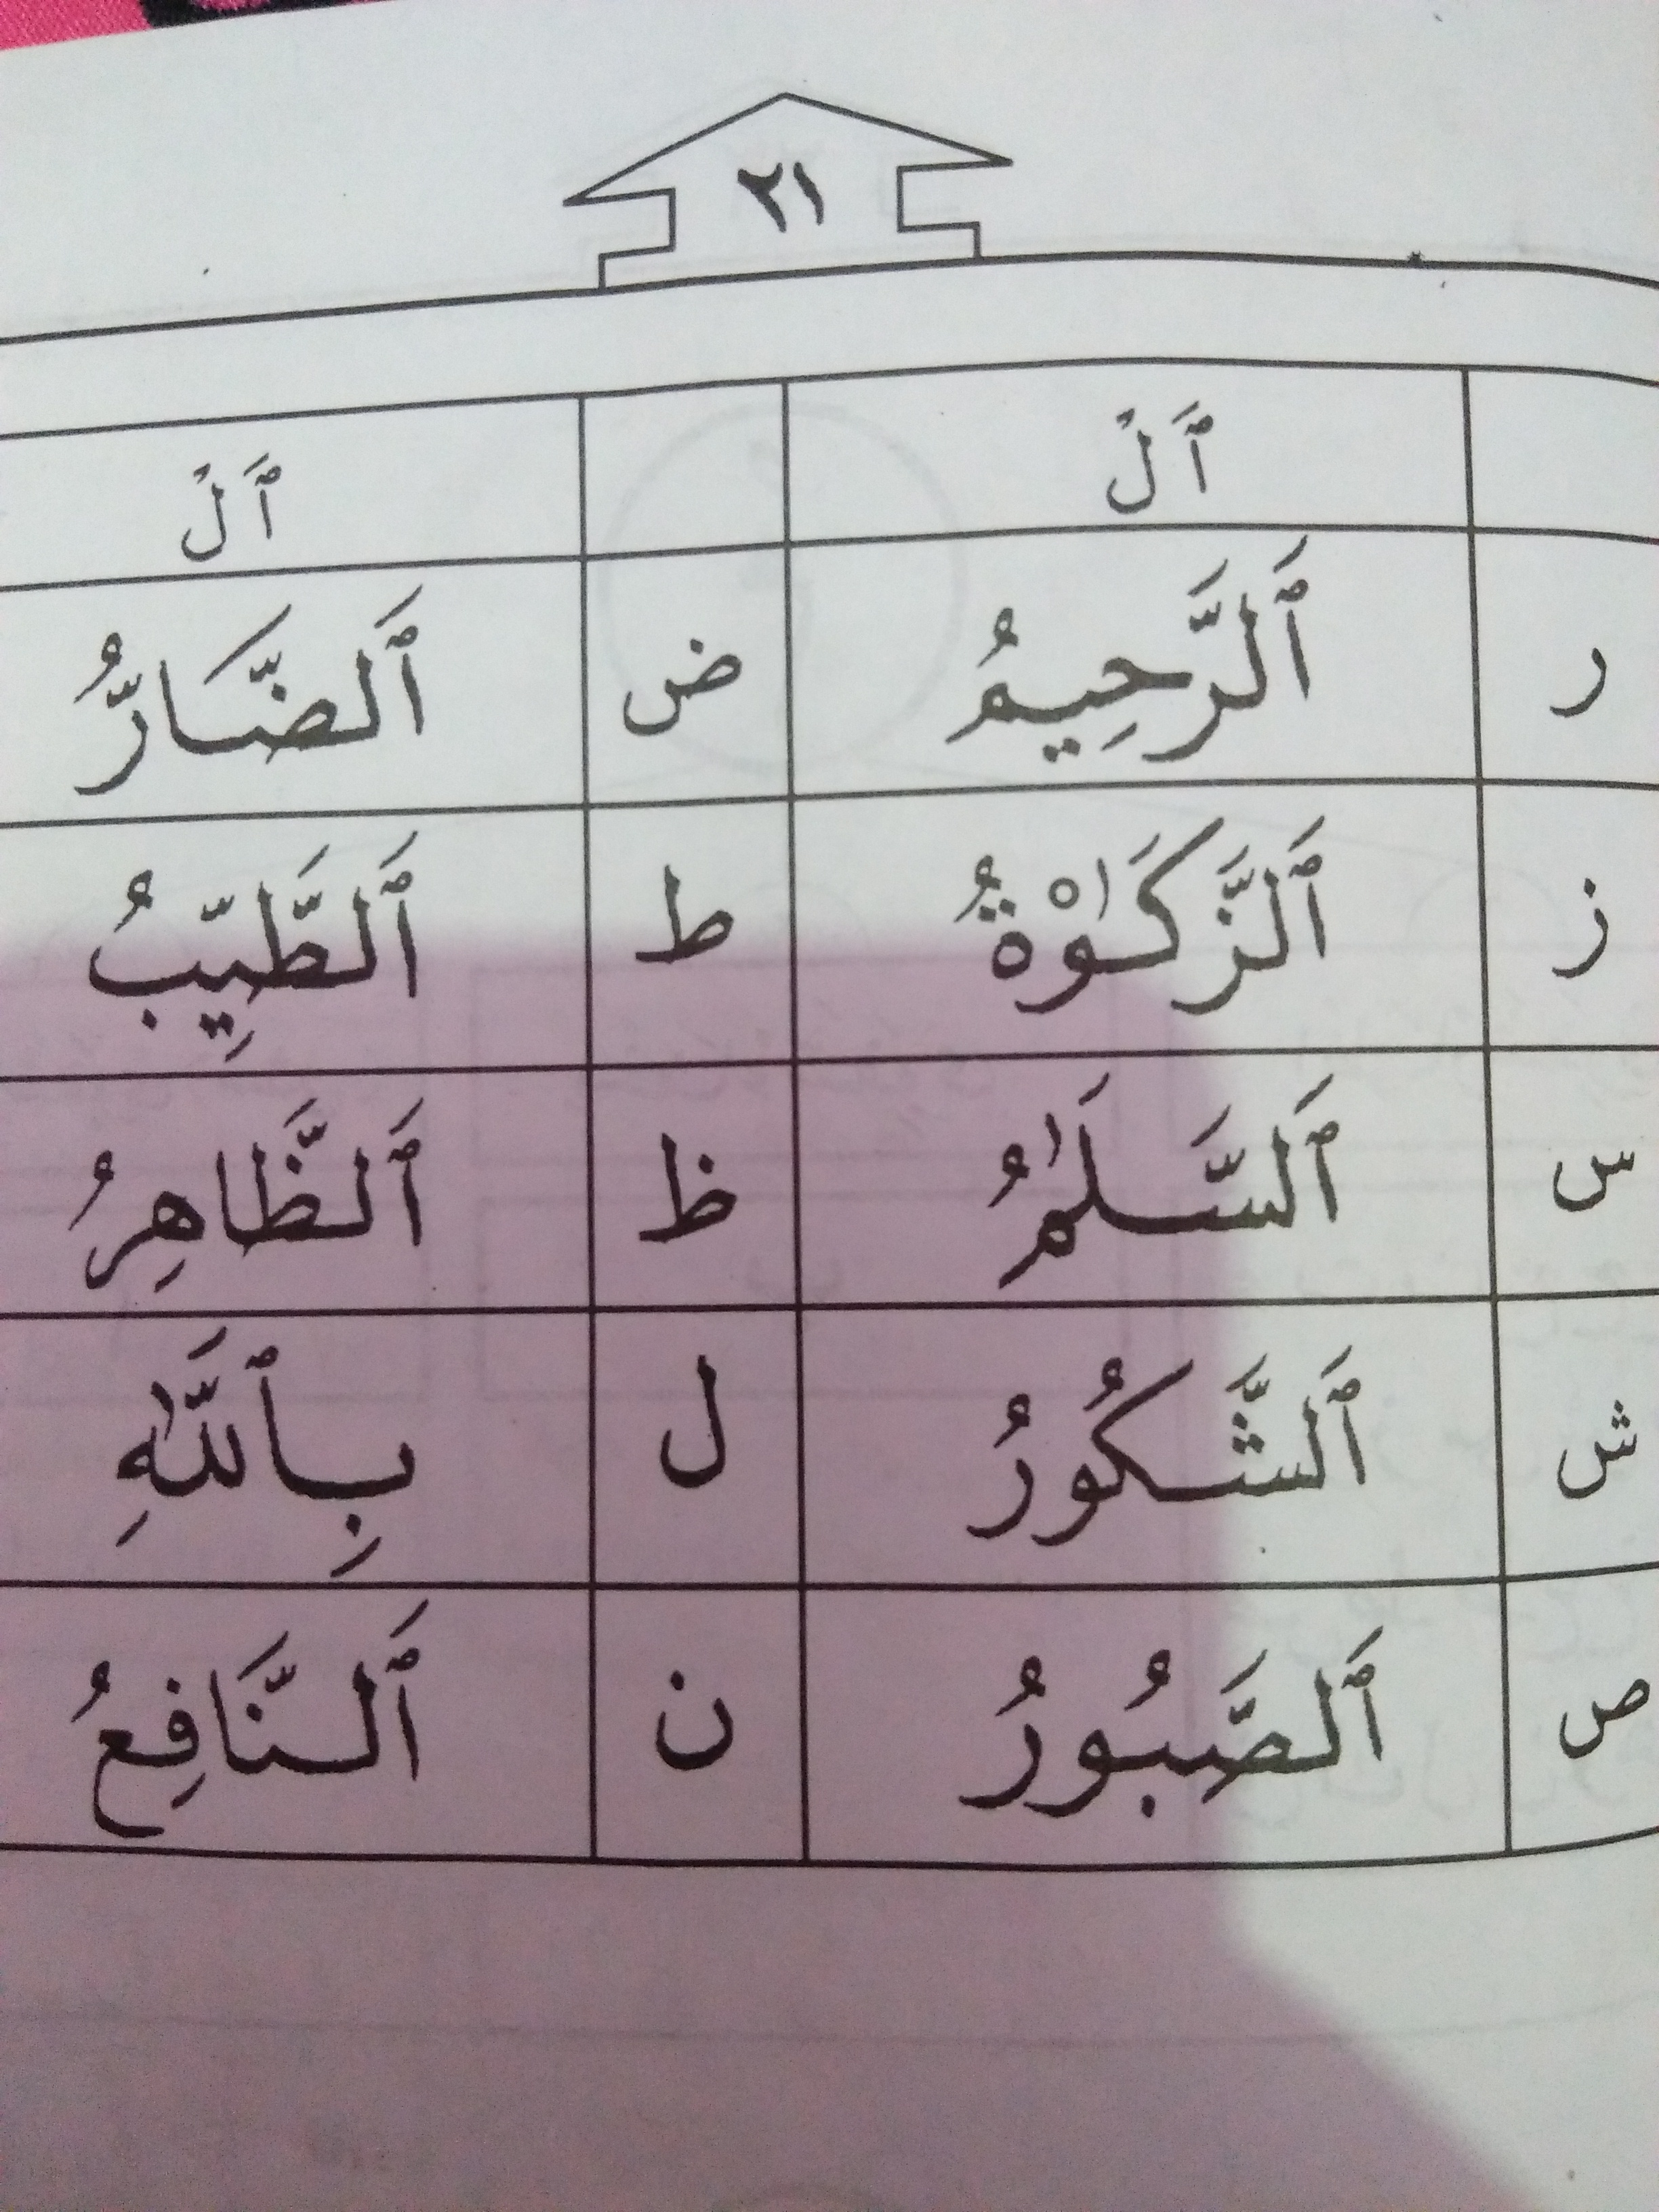 5 Contoh Hukum Bacaan Idqom Qomariyah Dan 5 Contoh Bacaan Izhar